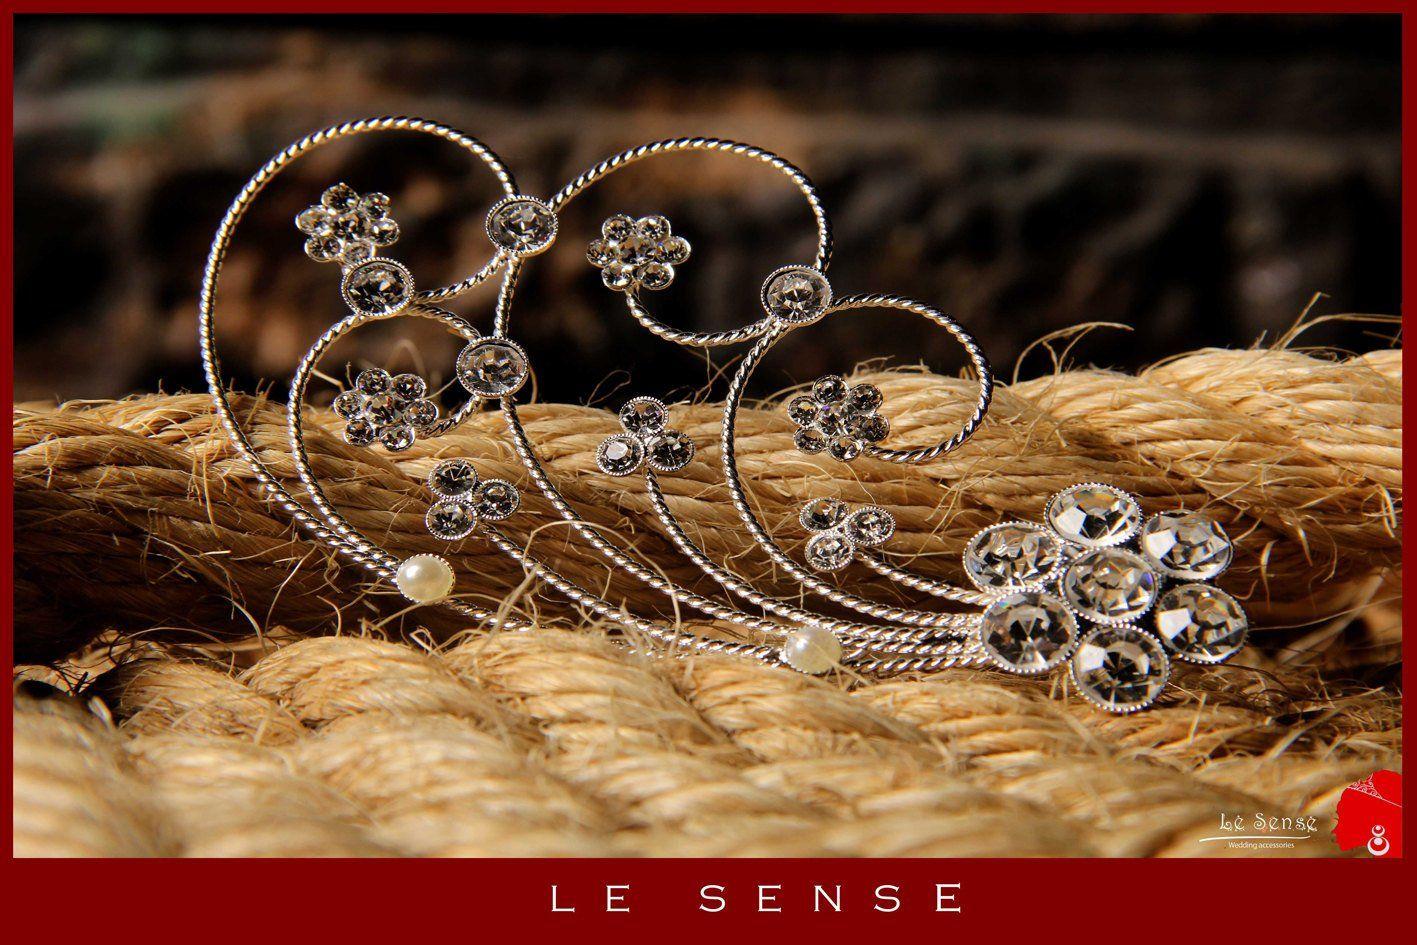 Unique handmade wedding silver hair pin crown tiara ,tiara crown ,head piece, hair comb ,hairpin inlaid with crystals and rhinestones #crowntiara